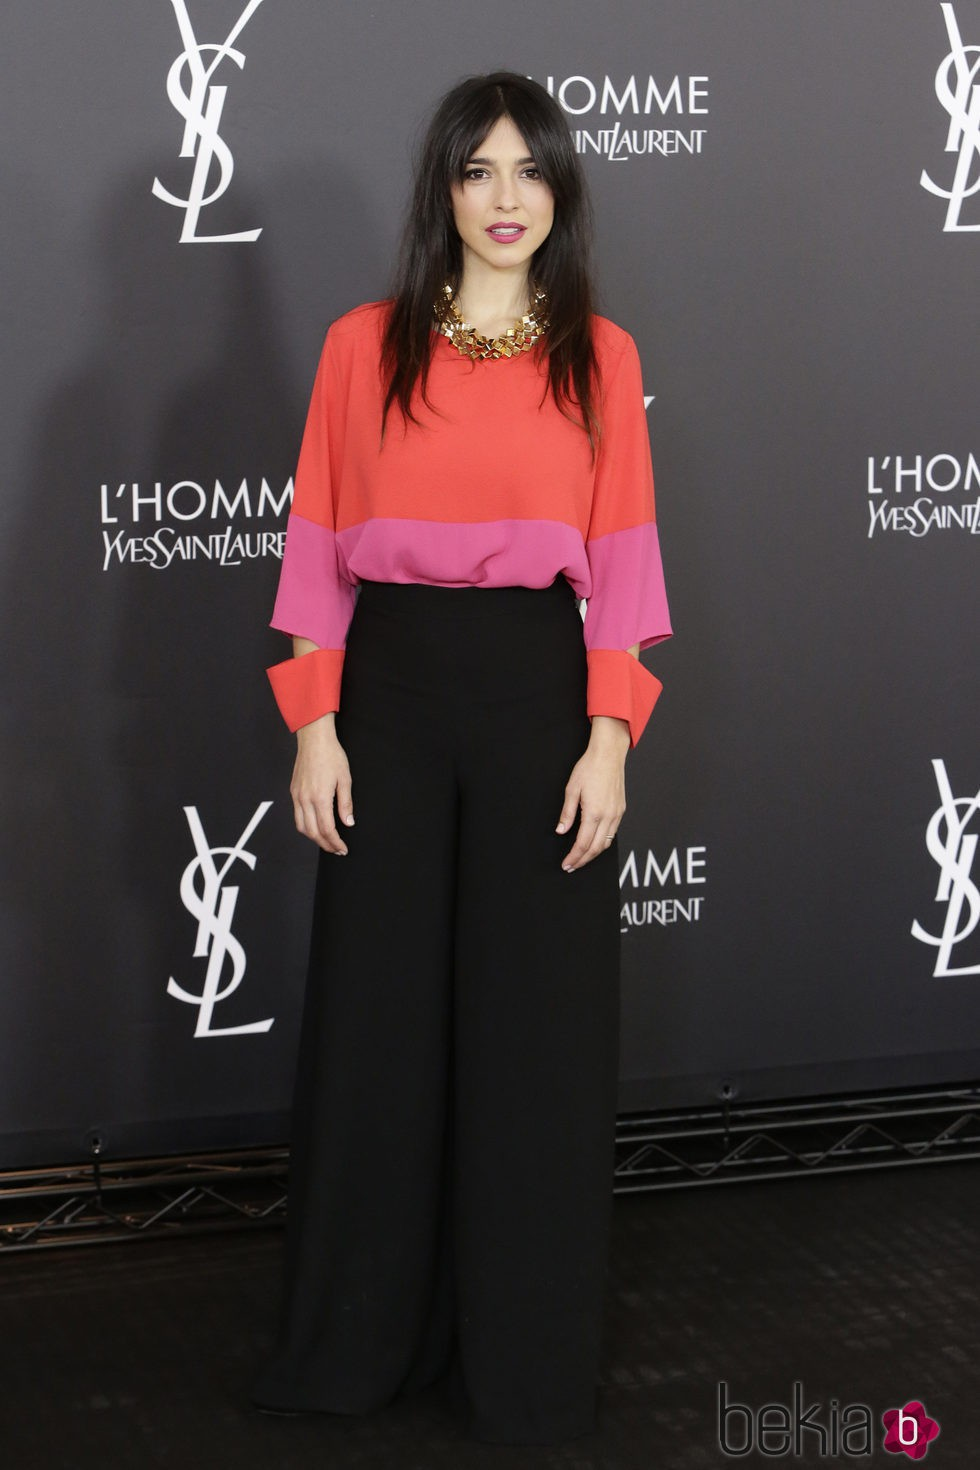 Cristina Brondo en el aniversario del perfume 'L'Homme' de Yves Saint Laurent en Madrid